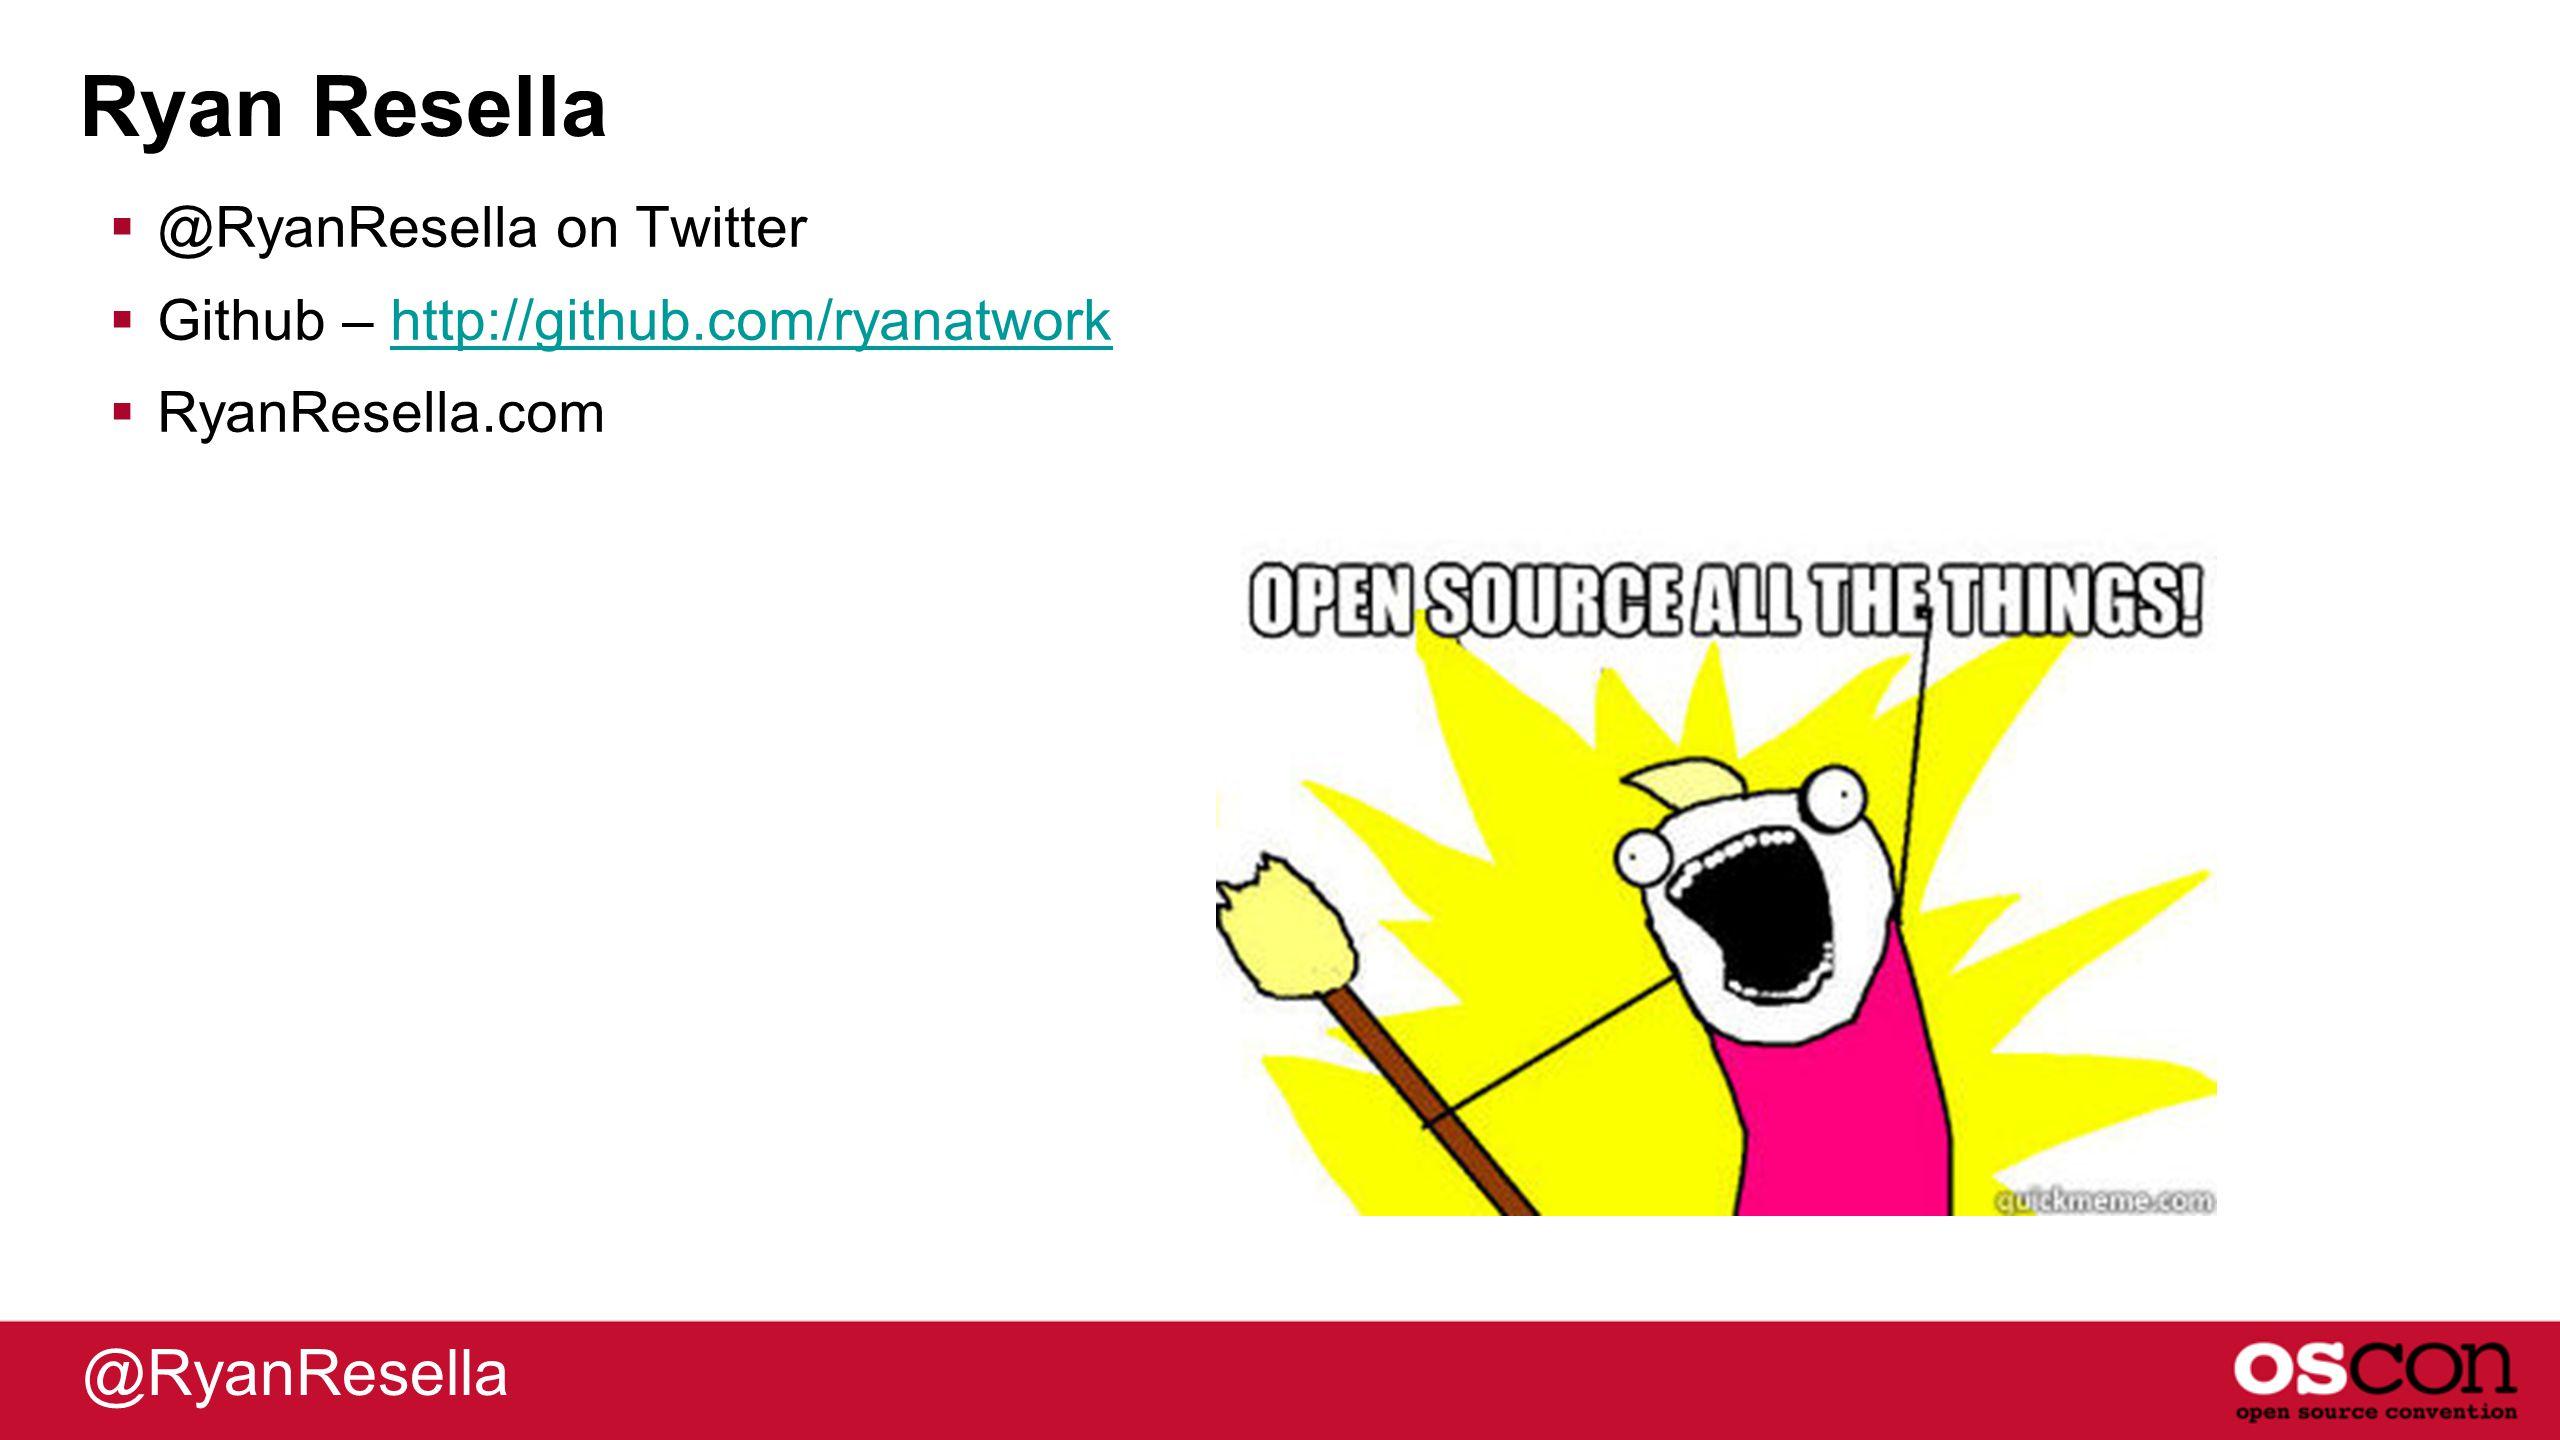 Ryan Resella  @RyanResella on Twitter  Github – http://github.com/ryanatworkhttp://github.com/ryanatwork  RyanResella.com @RyanResella